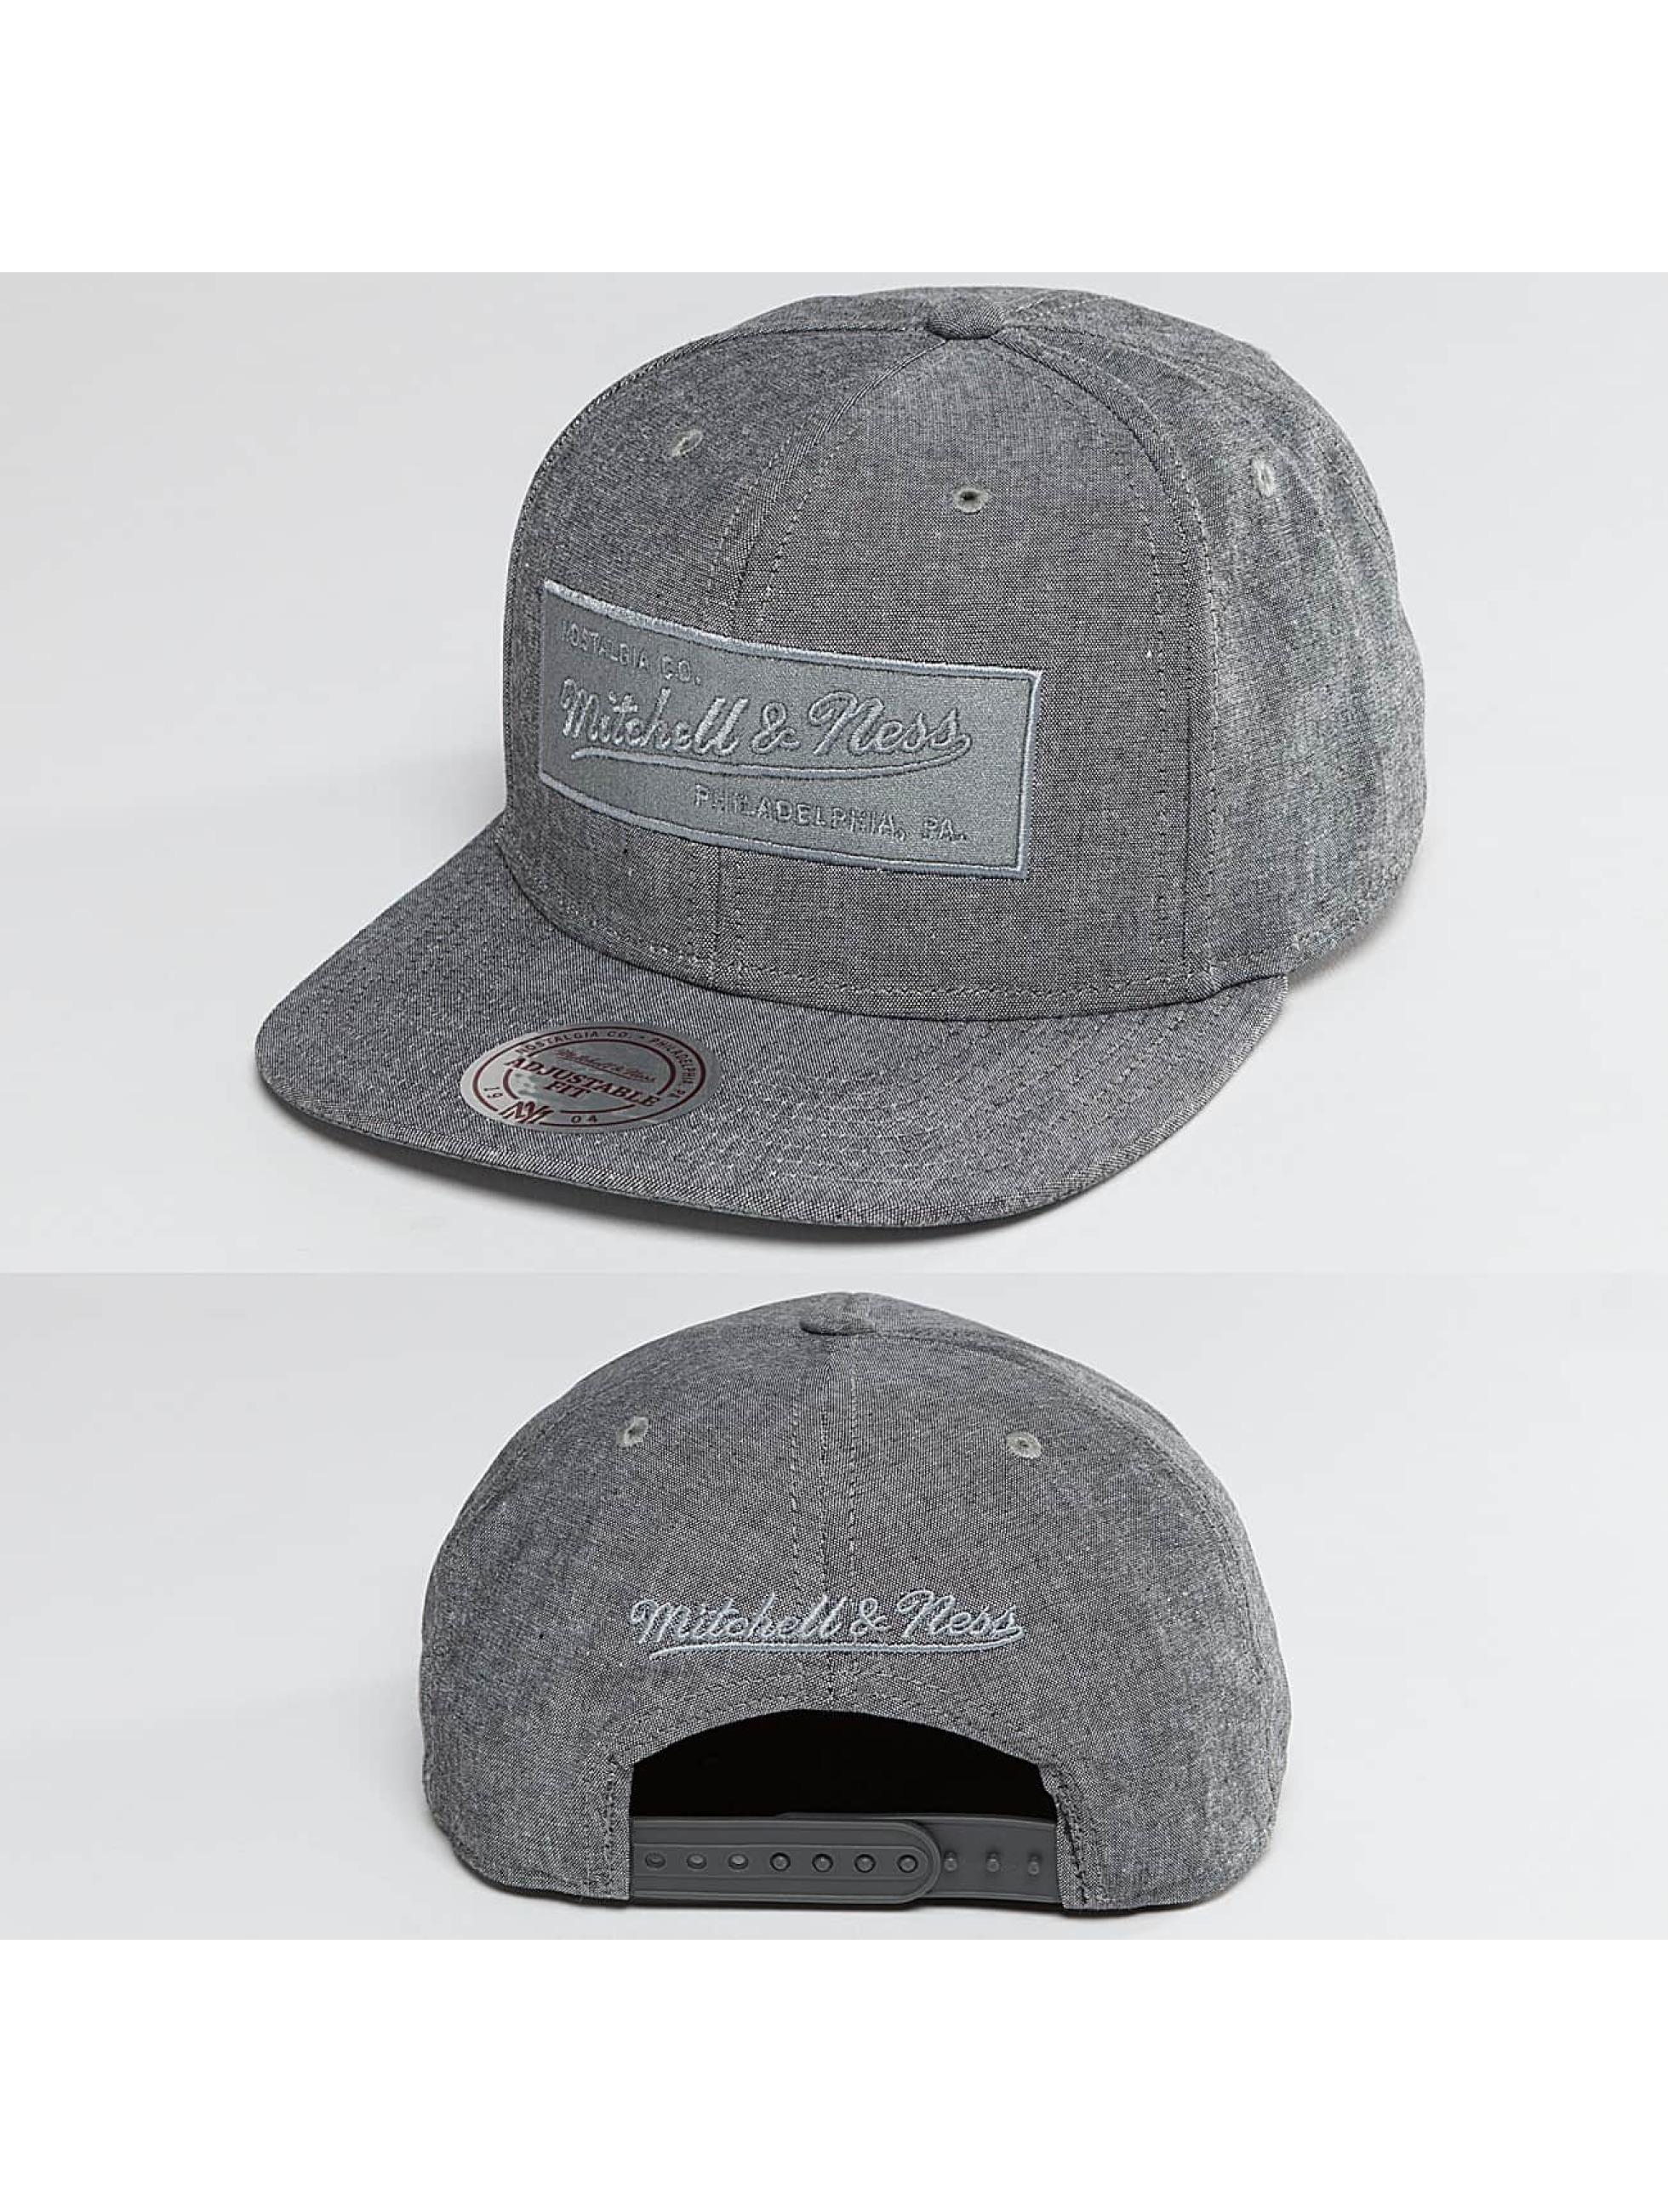 Mitchell & Ness Männer,Frauen Snapback Cap Italian Washed in grau